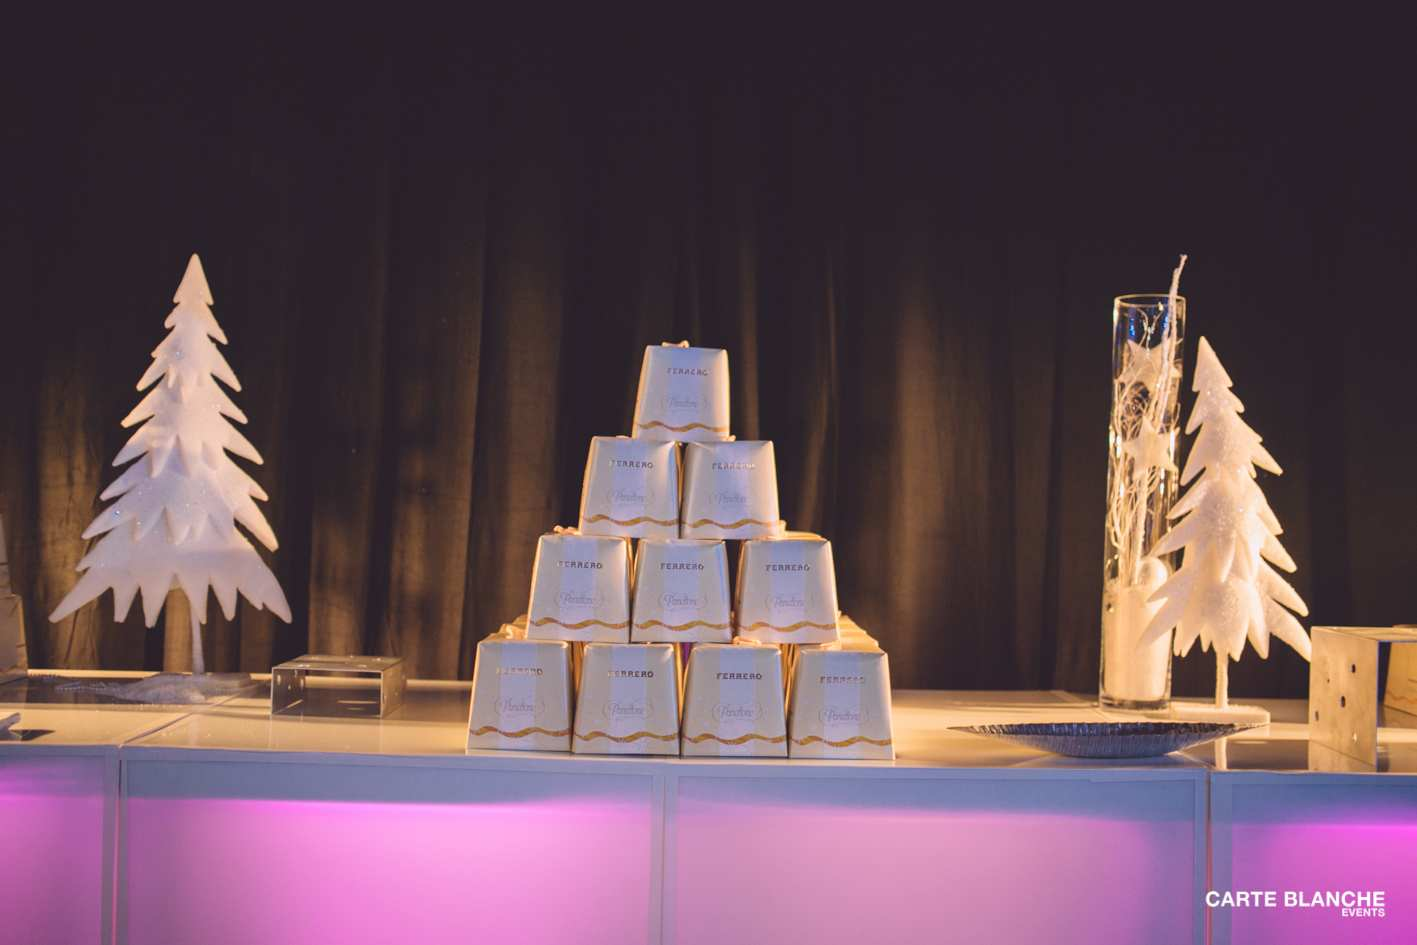 xmas-party-ferrero-2013-gourmandise-chocolat-projet